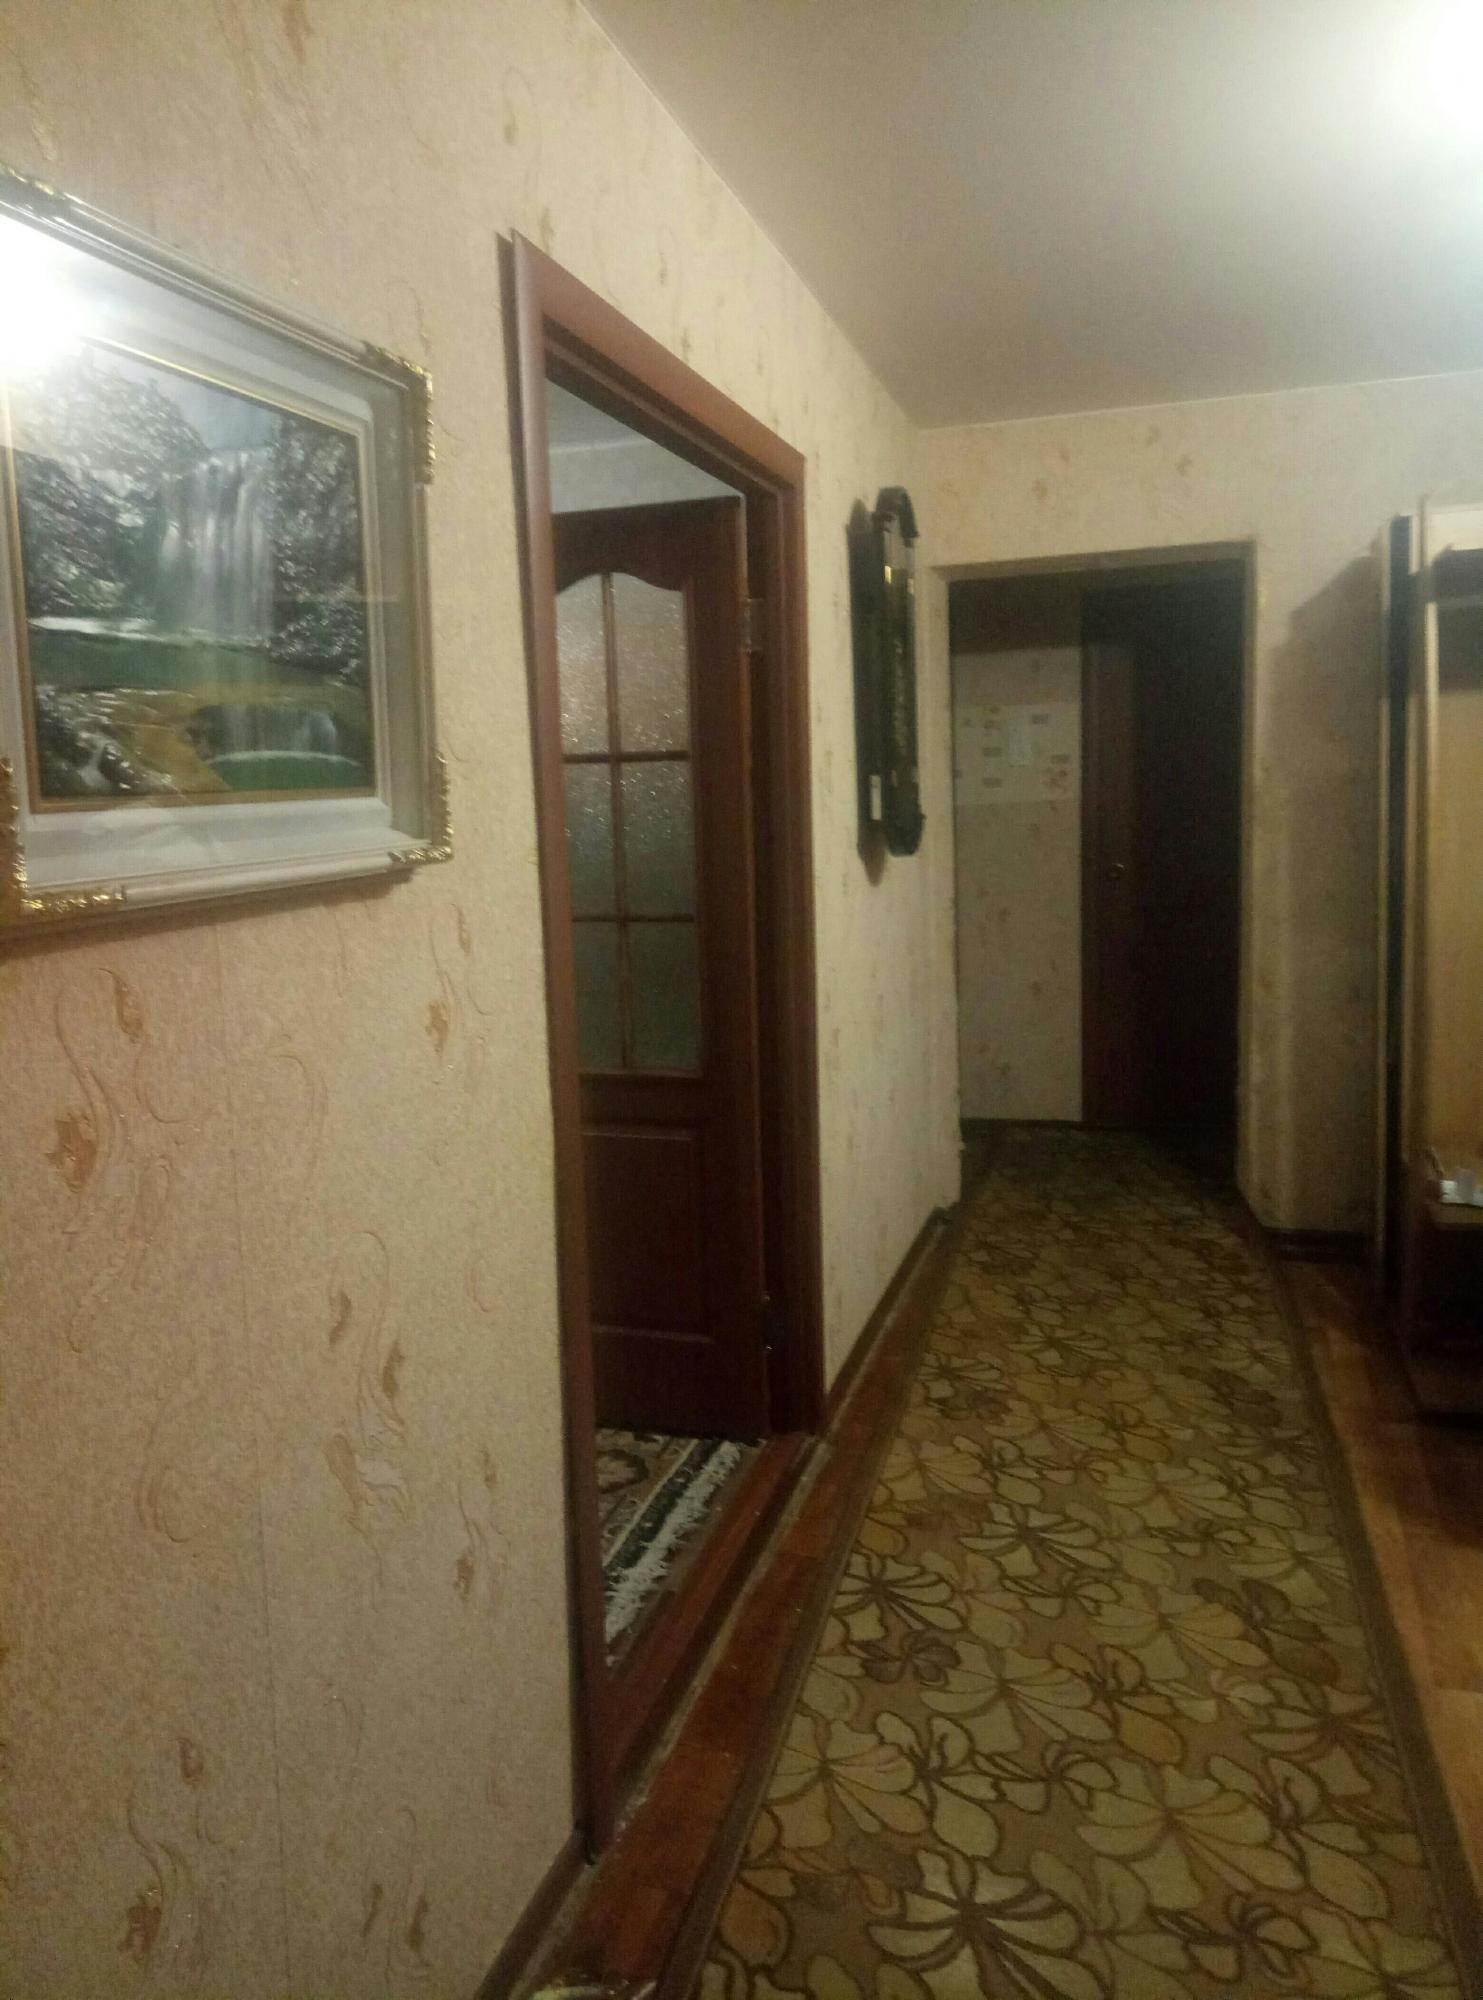 2к квартира улица 26 Бакинских комиссаров, 26 | 15000 | аренда в Красноярске фото 4